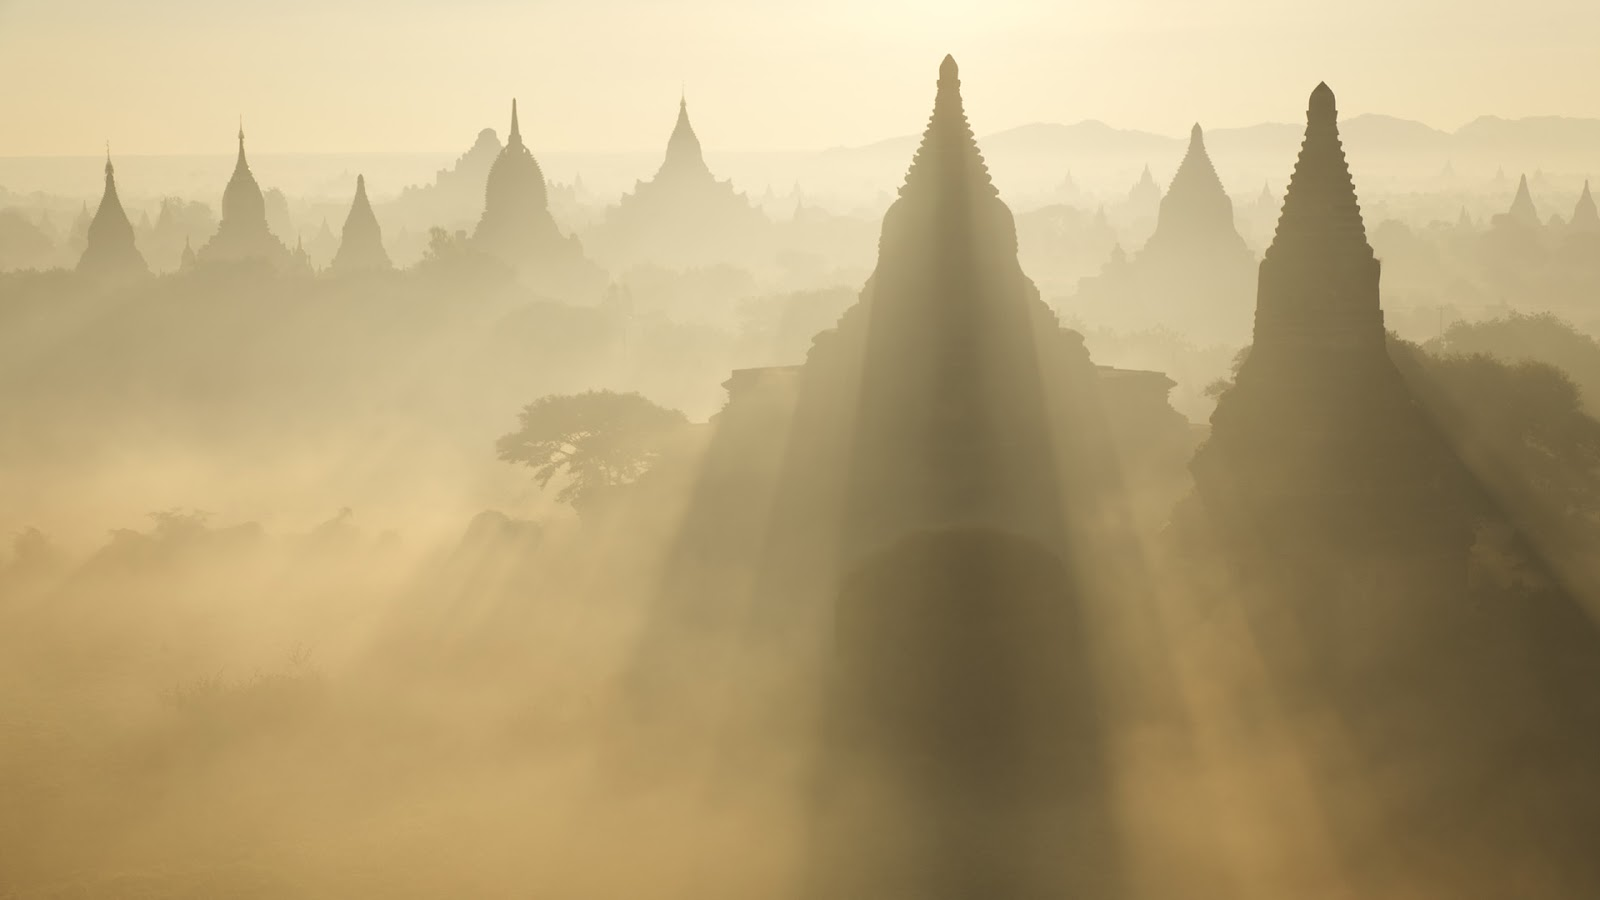 myanmar wallpaper images travel tourism